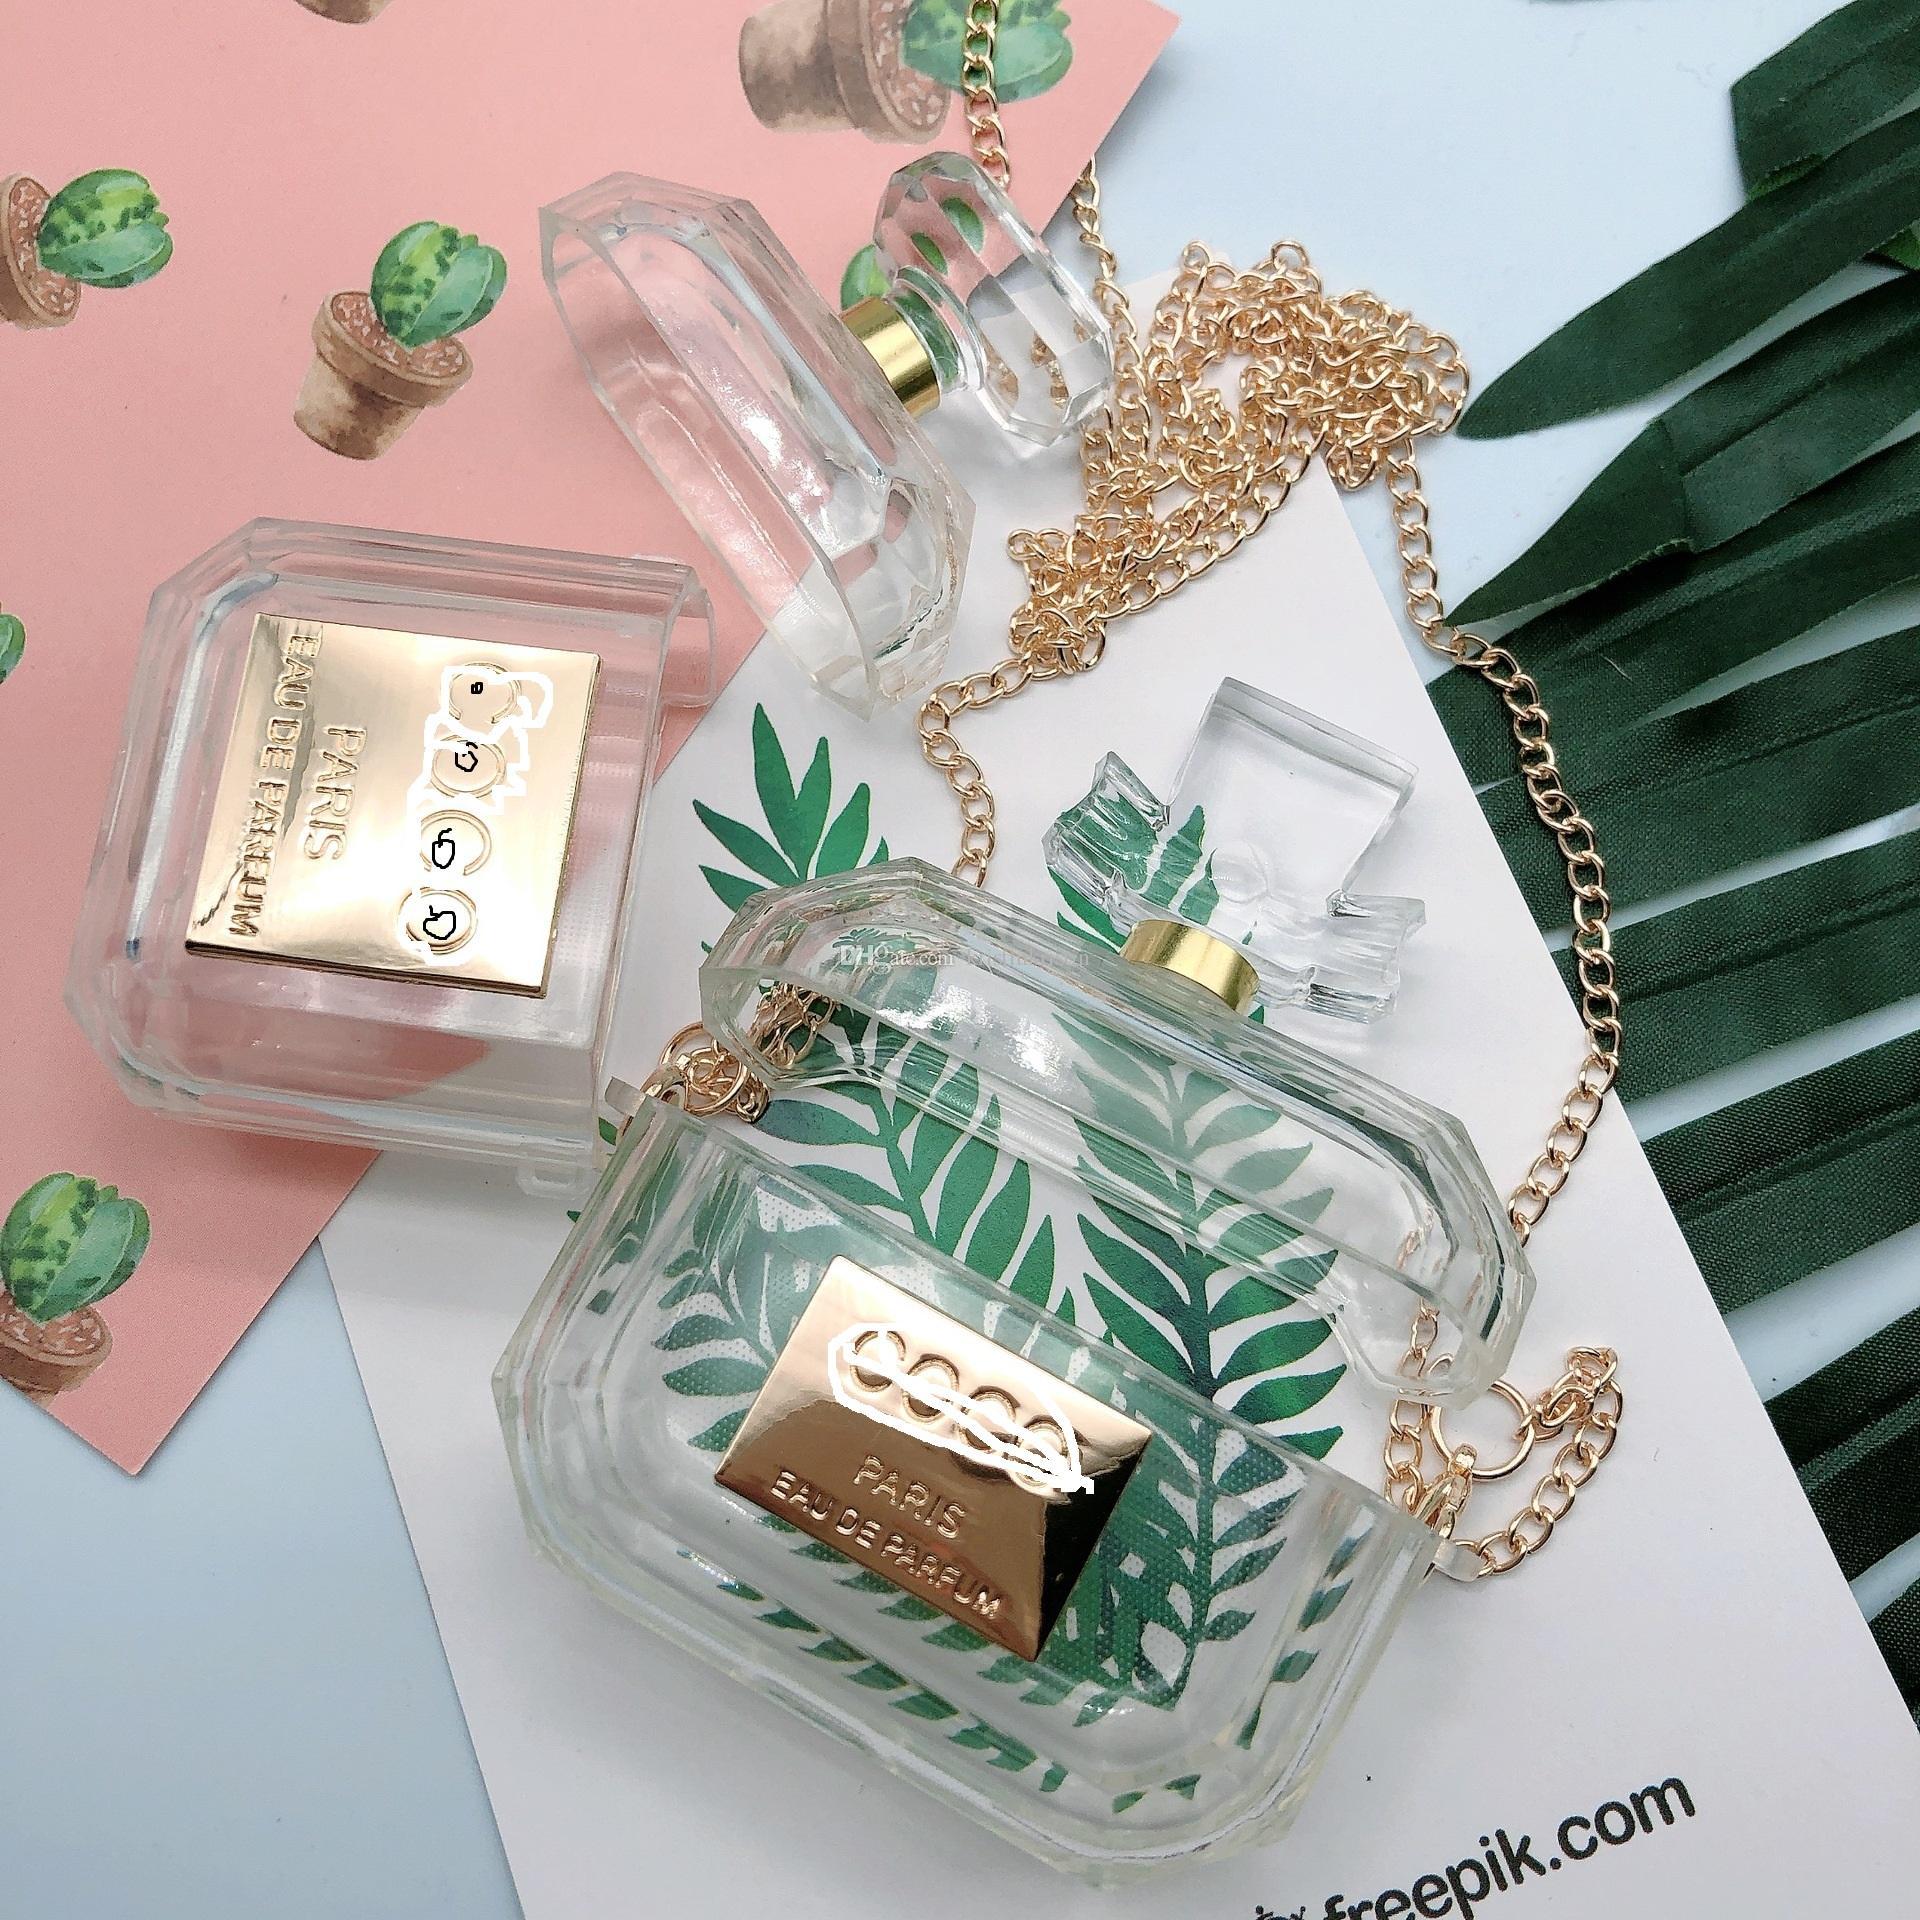 2020 Stylish Fashion Perfume Bottle Case For Airpods Pro Creative